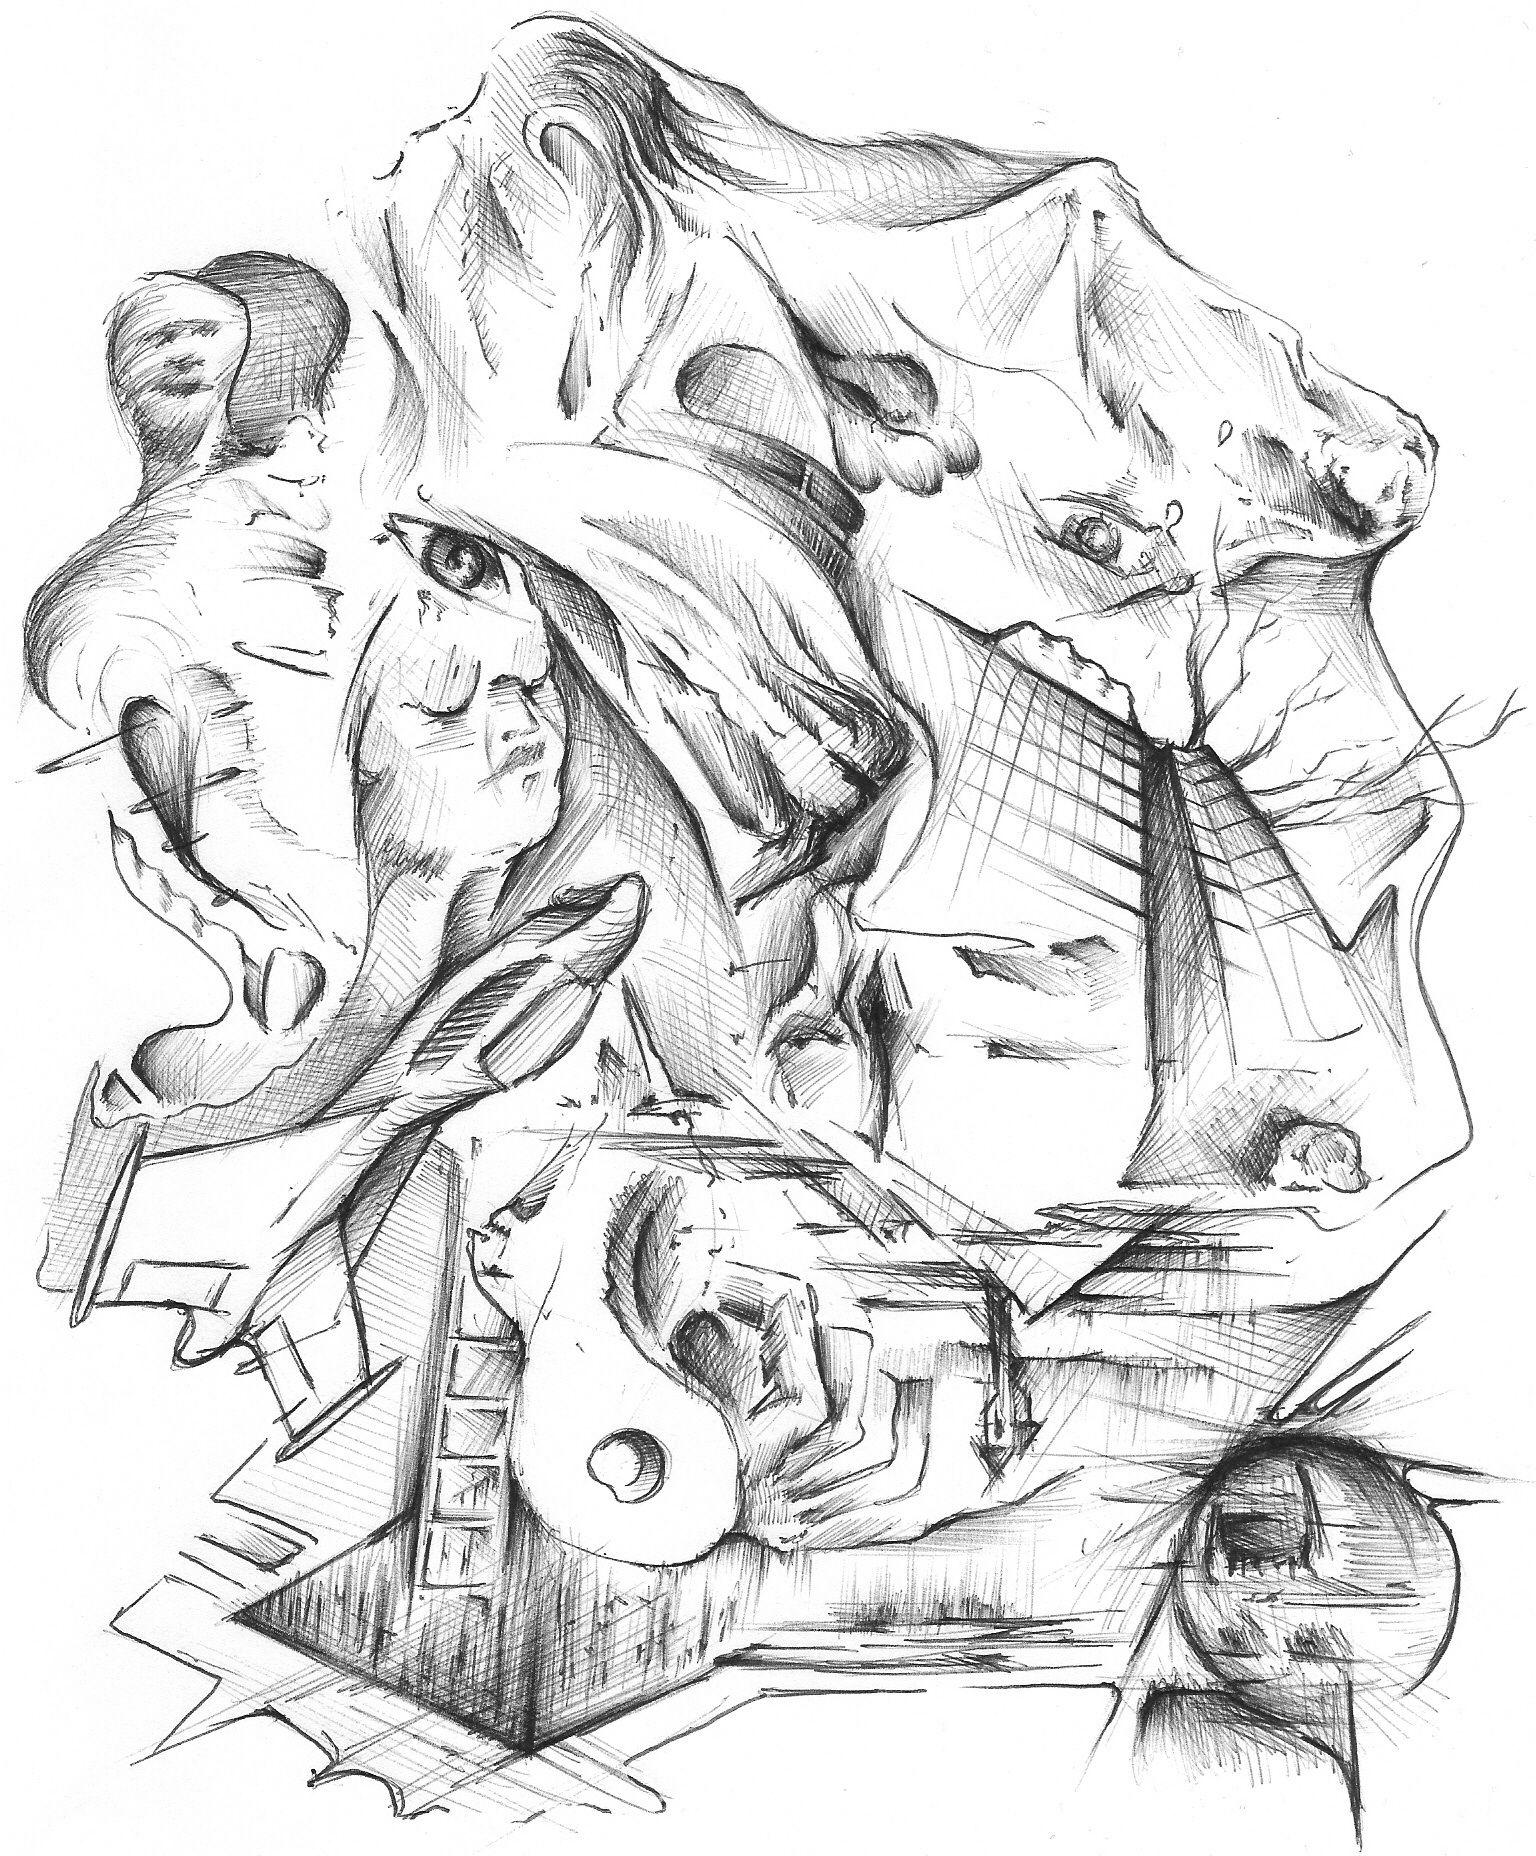 rrrickyshaw.com 2009 abstract surreal